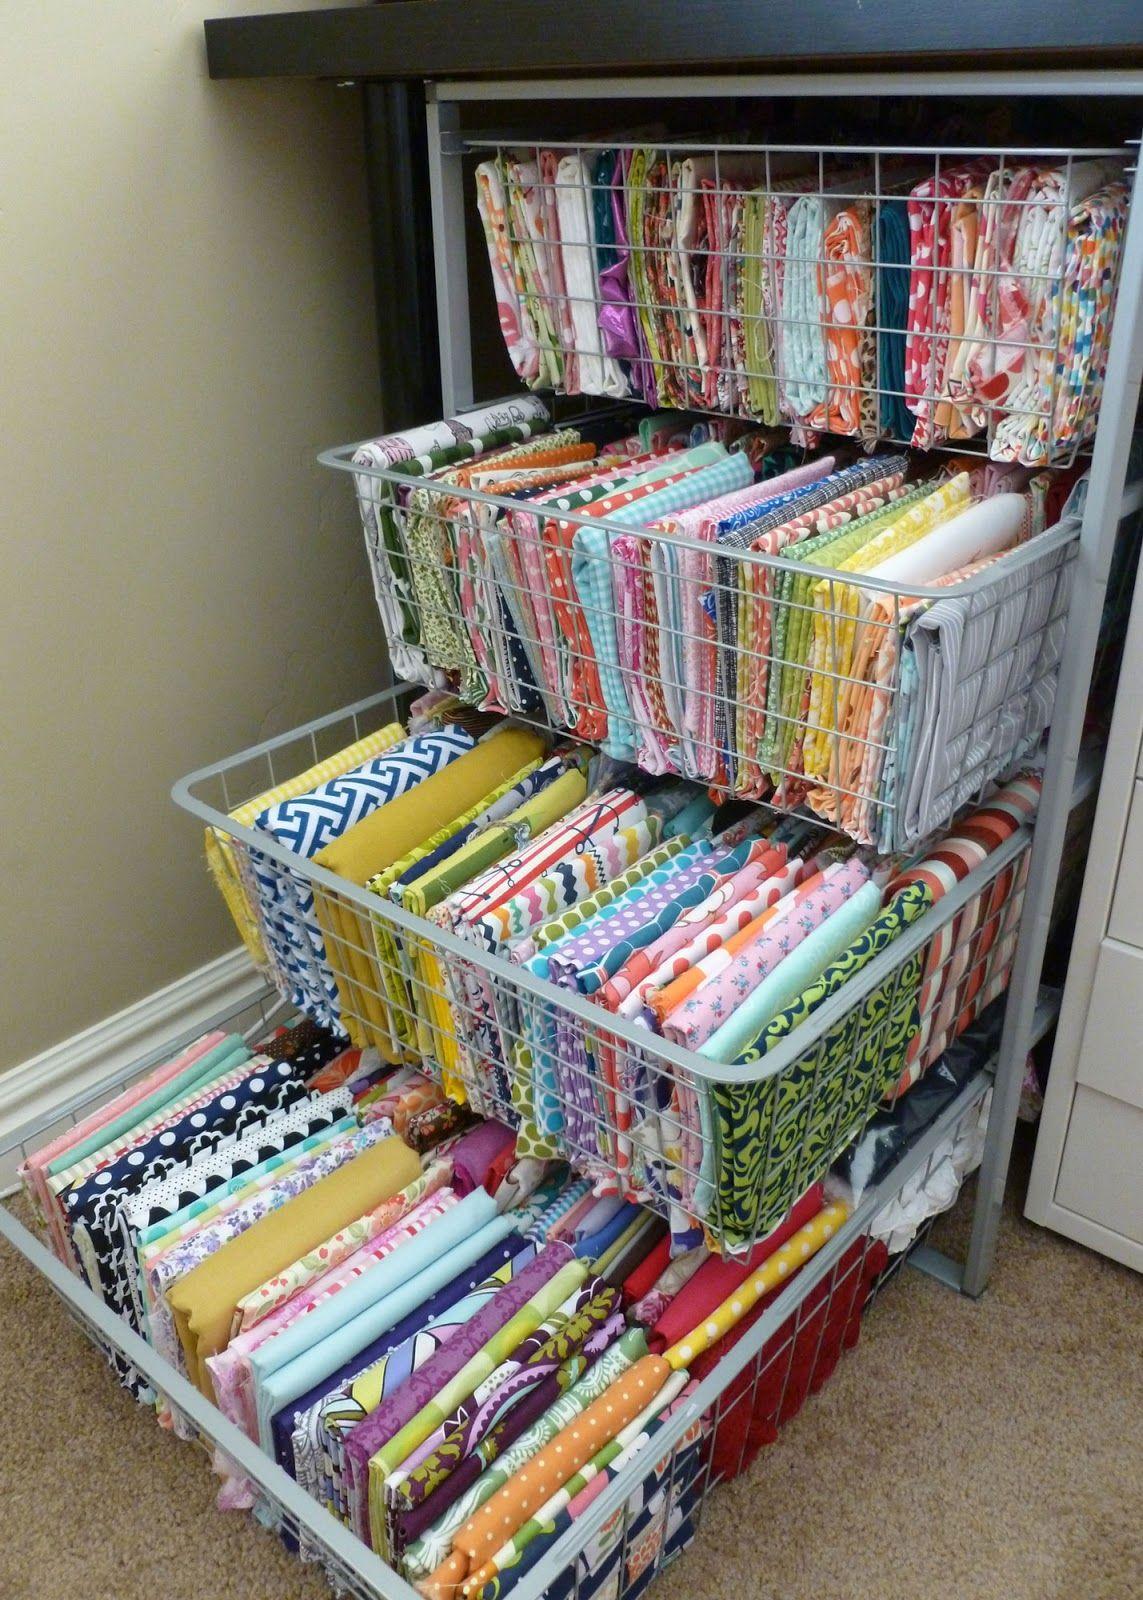 Uncategorized The Fabric Organizer fabricfamily the ruby sue studio things to do pinterest fabric organizerfabric